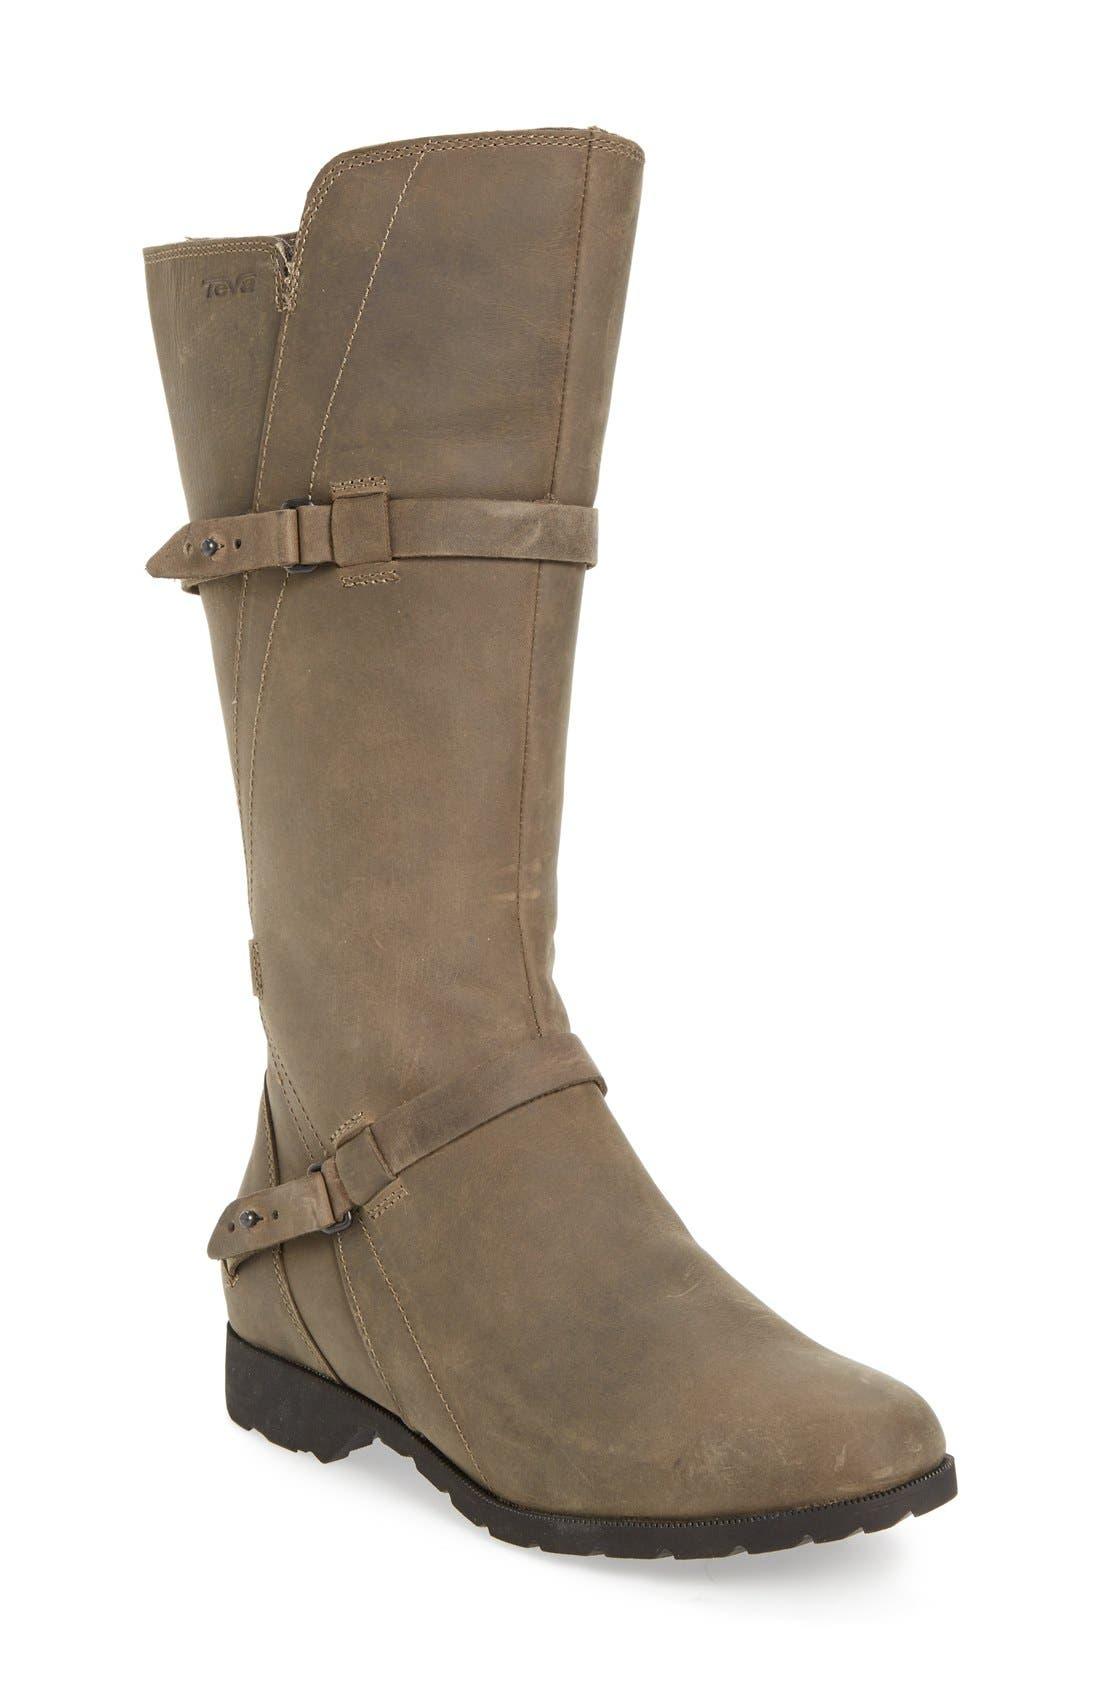 Teva 'De La Vina' Waterproof Riding Boot (Women)